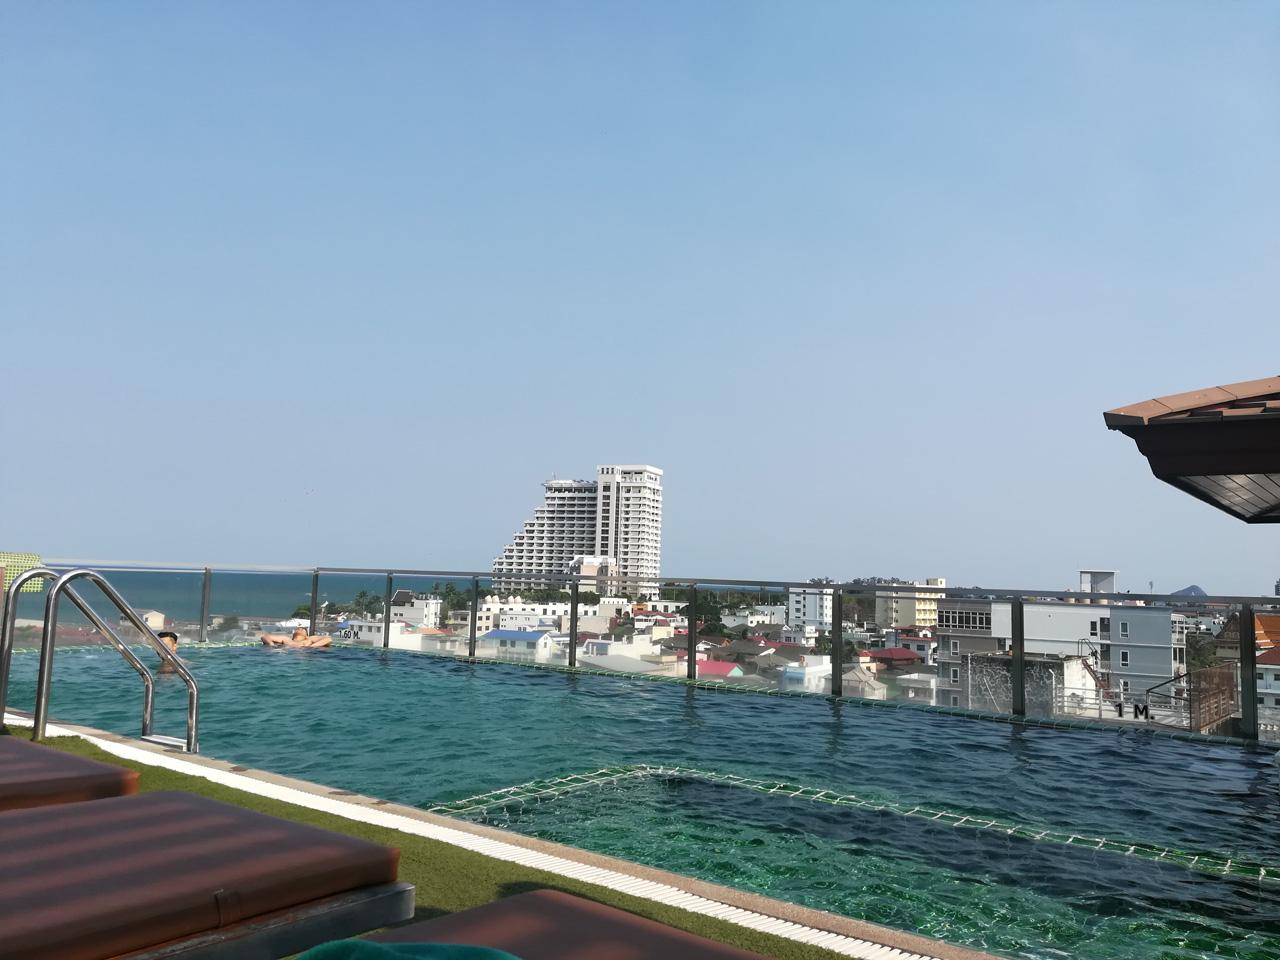 Chalelarn Hotel Roof Top Swimming Pool